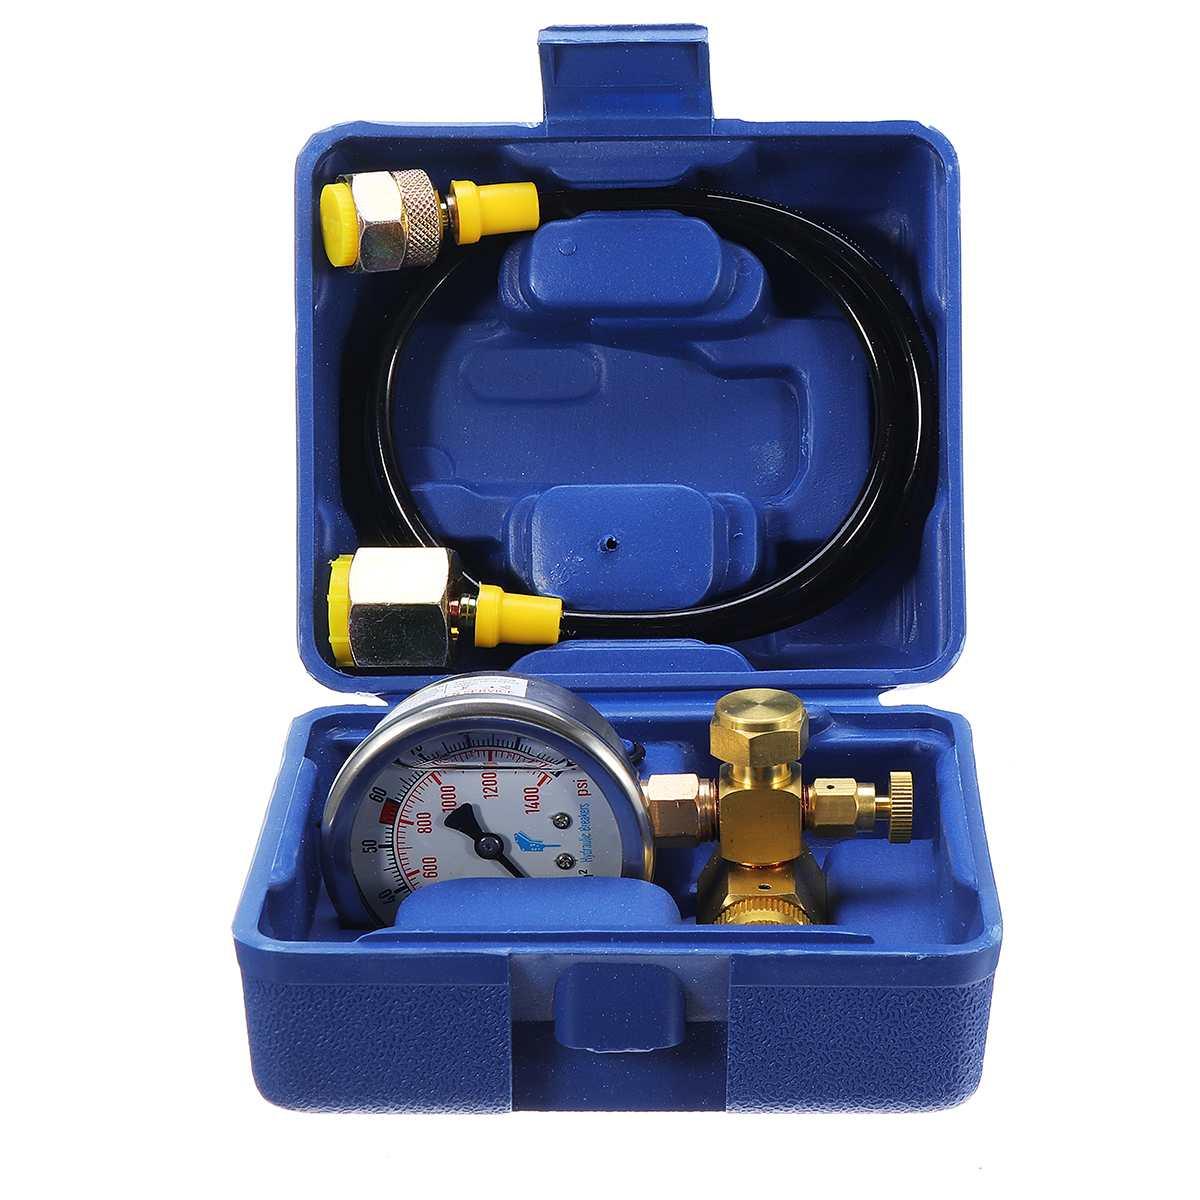 6cm Dia. Pressure Gauges Kit Hydraulic Accumulator Nitrogen Charging Filling Gas Valve Test Kit For Furukawa Soosan-JY04